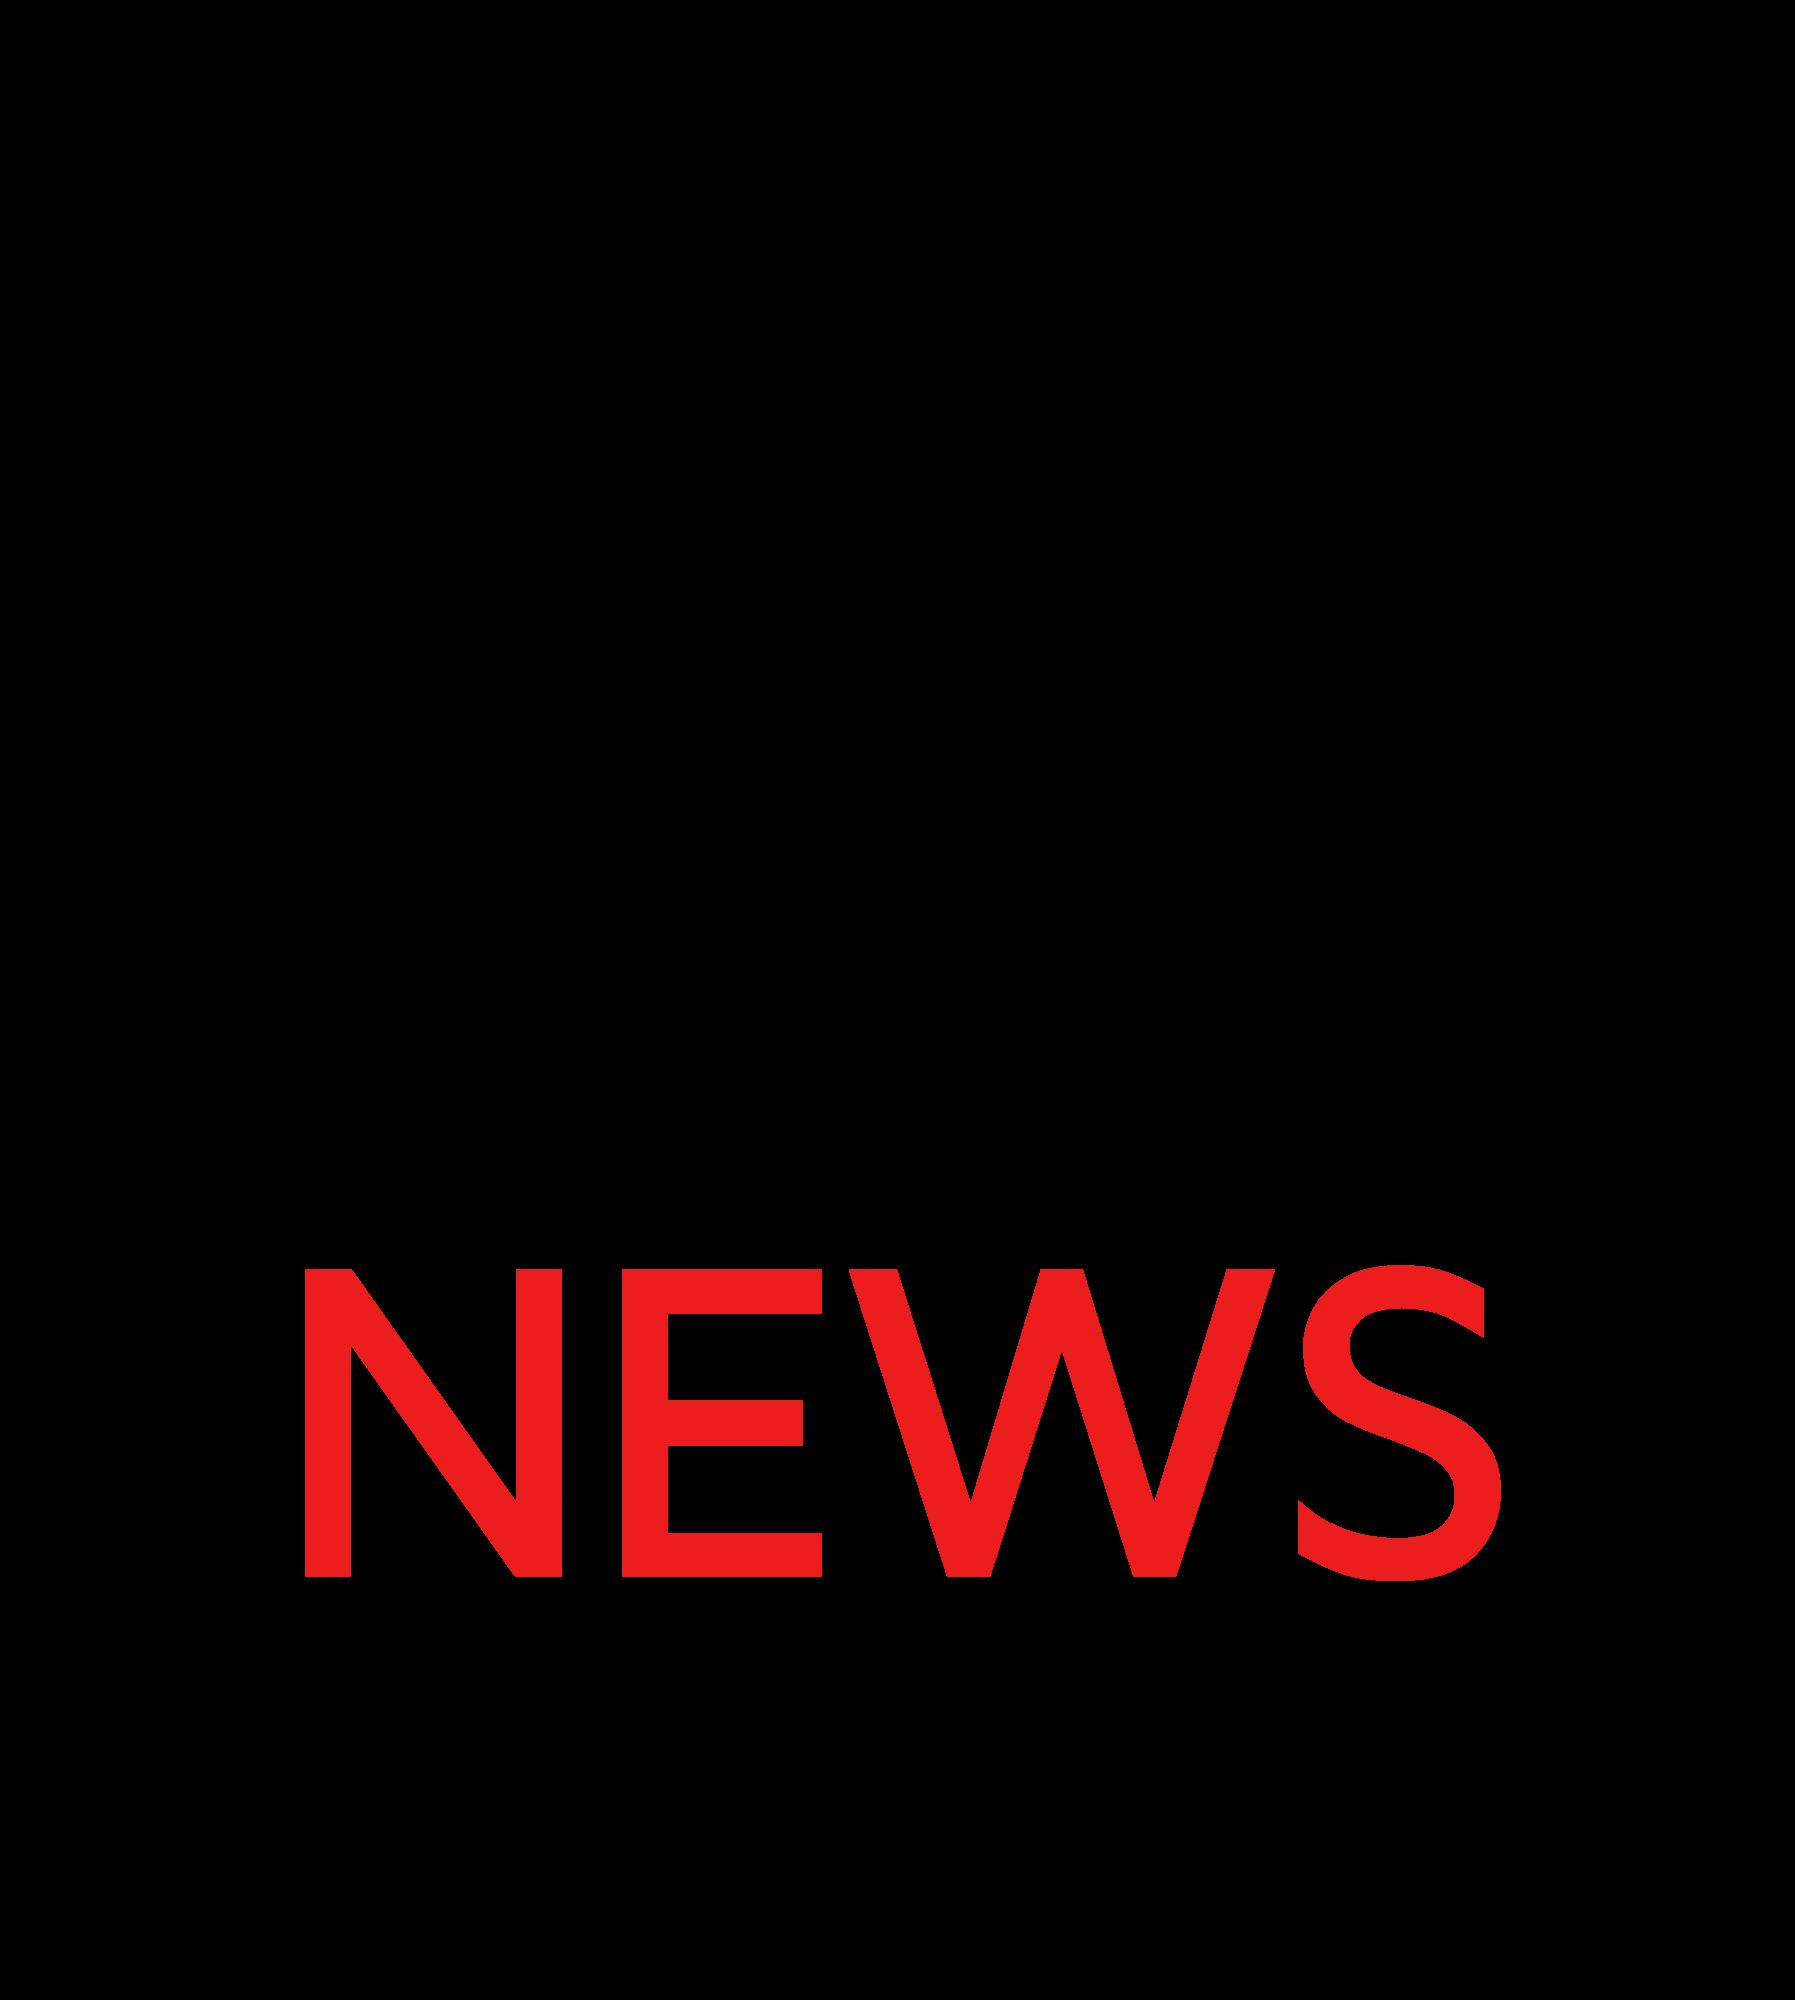 NEWS-logo (1).png